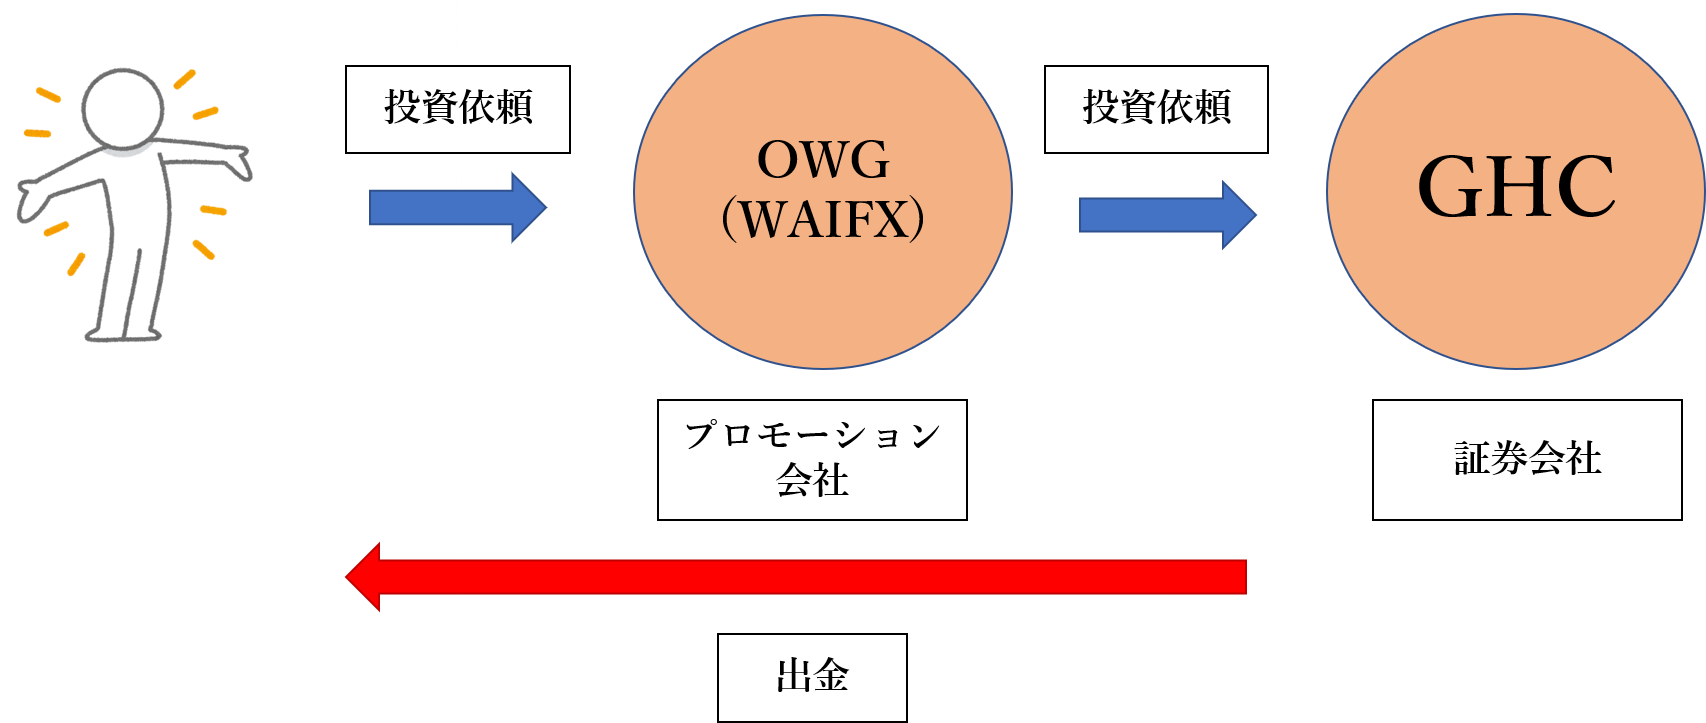 WAIFX